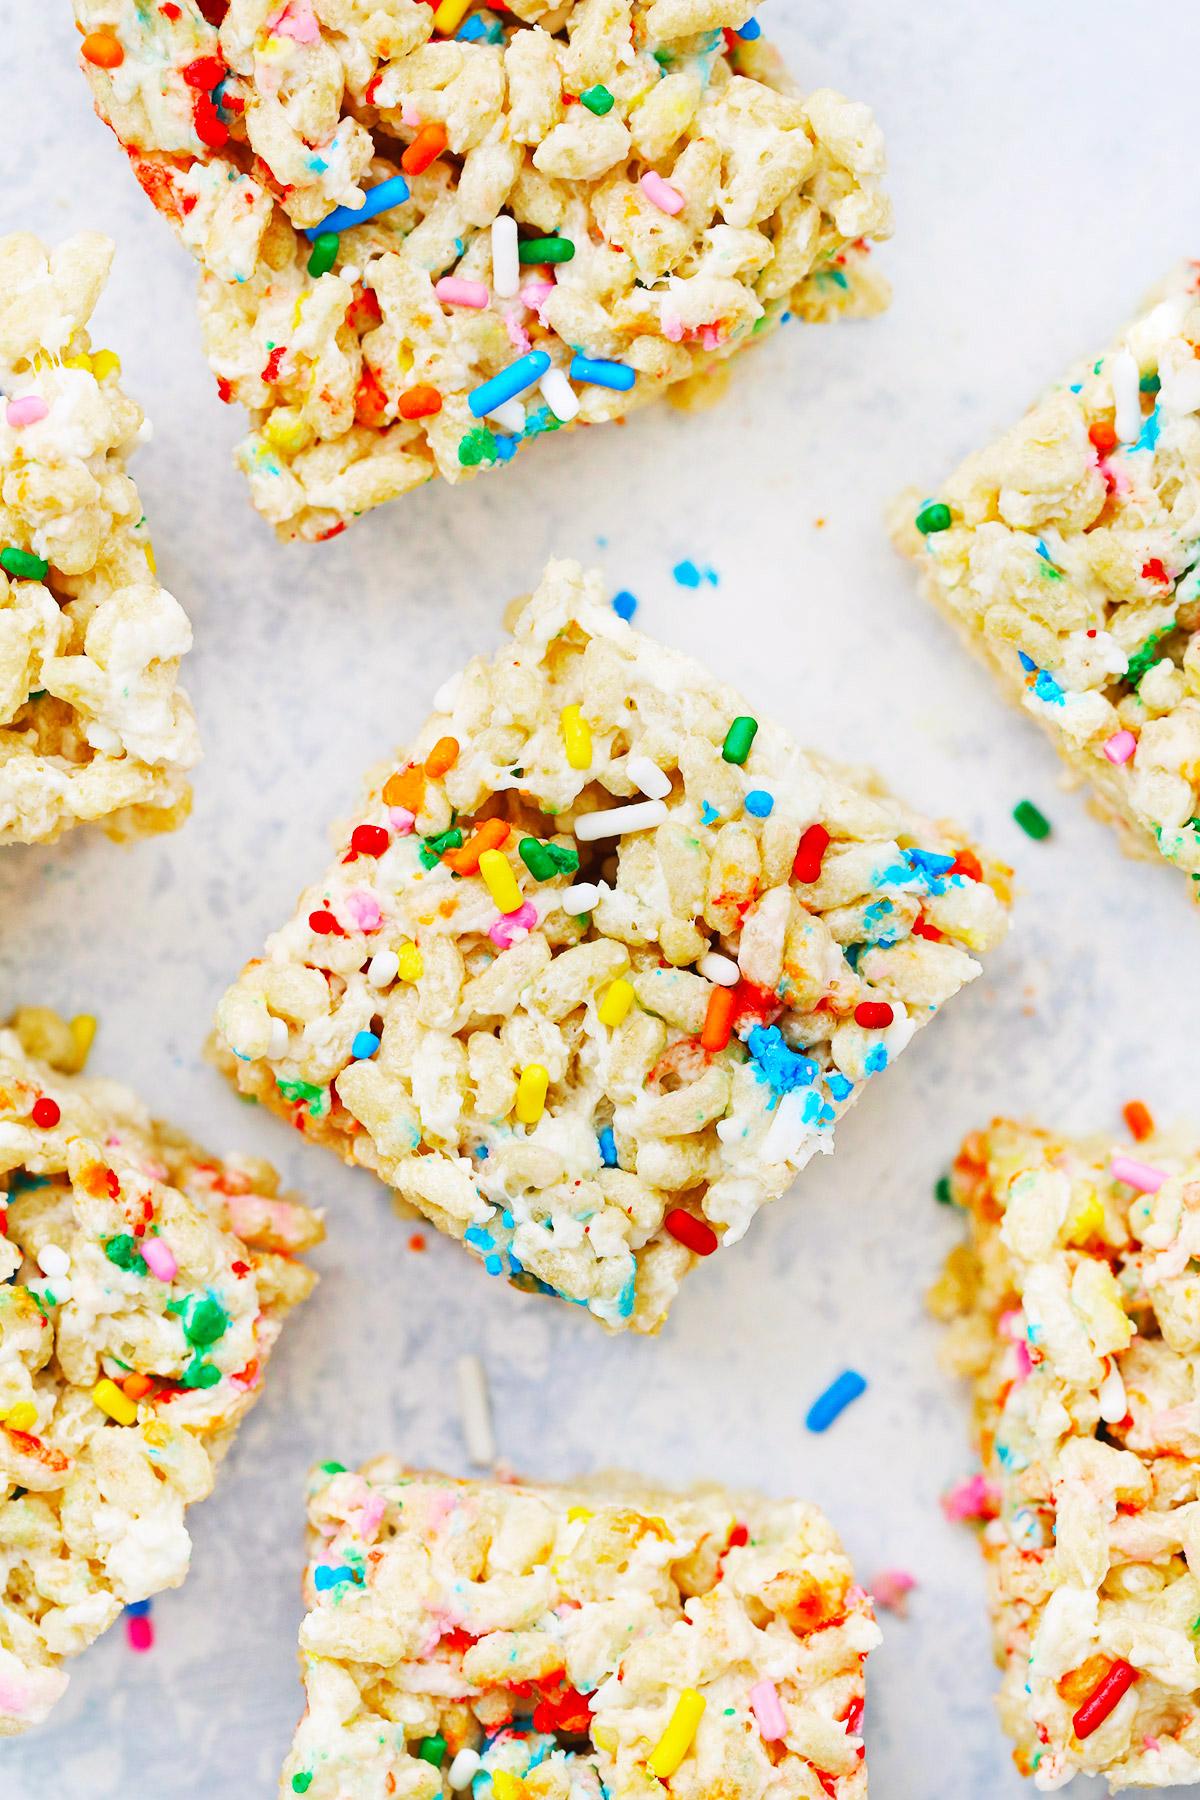 Wondrous Funfetti Birthday Cake Rice Krispies Treats Gluten Free Vegan Personalised Birthday Cards Sponlily Jamesorg